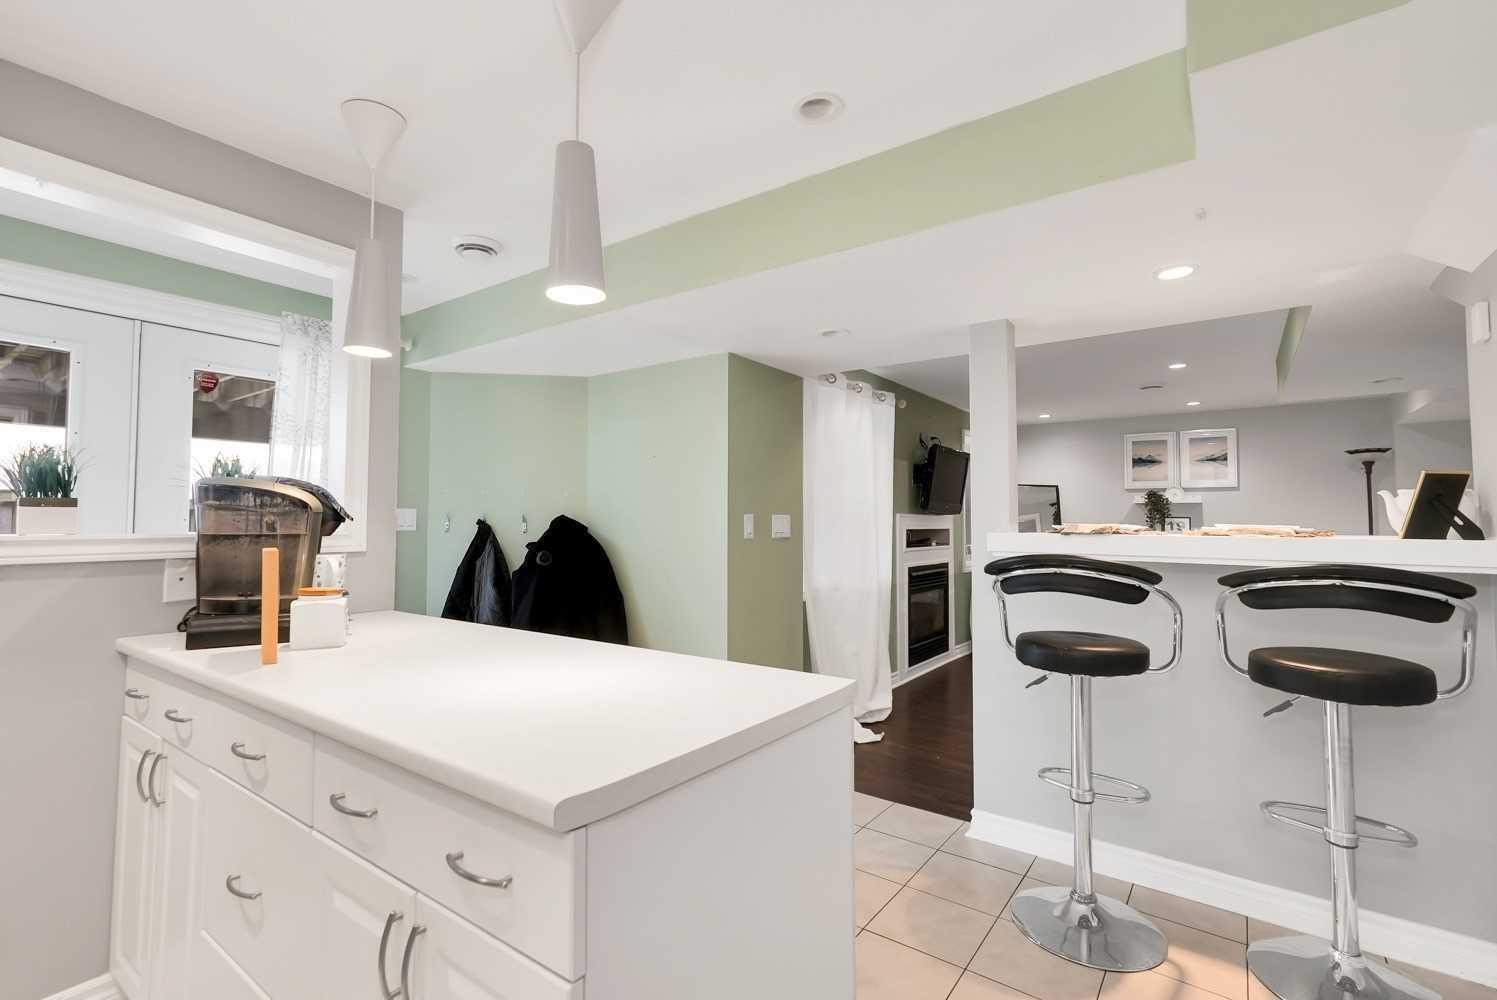 27 Kersey Cres, Clarington, Ontario L1E0A5, 1 Bedroom Bedrooms, ,1 BathroomBathrooms,Detached,For Lease,Kersey,E5273627